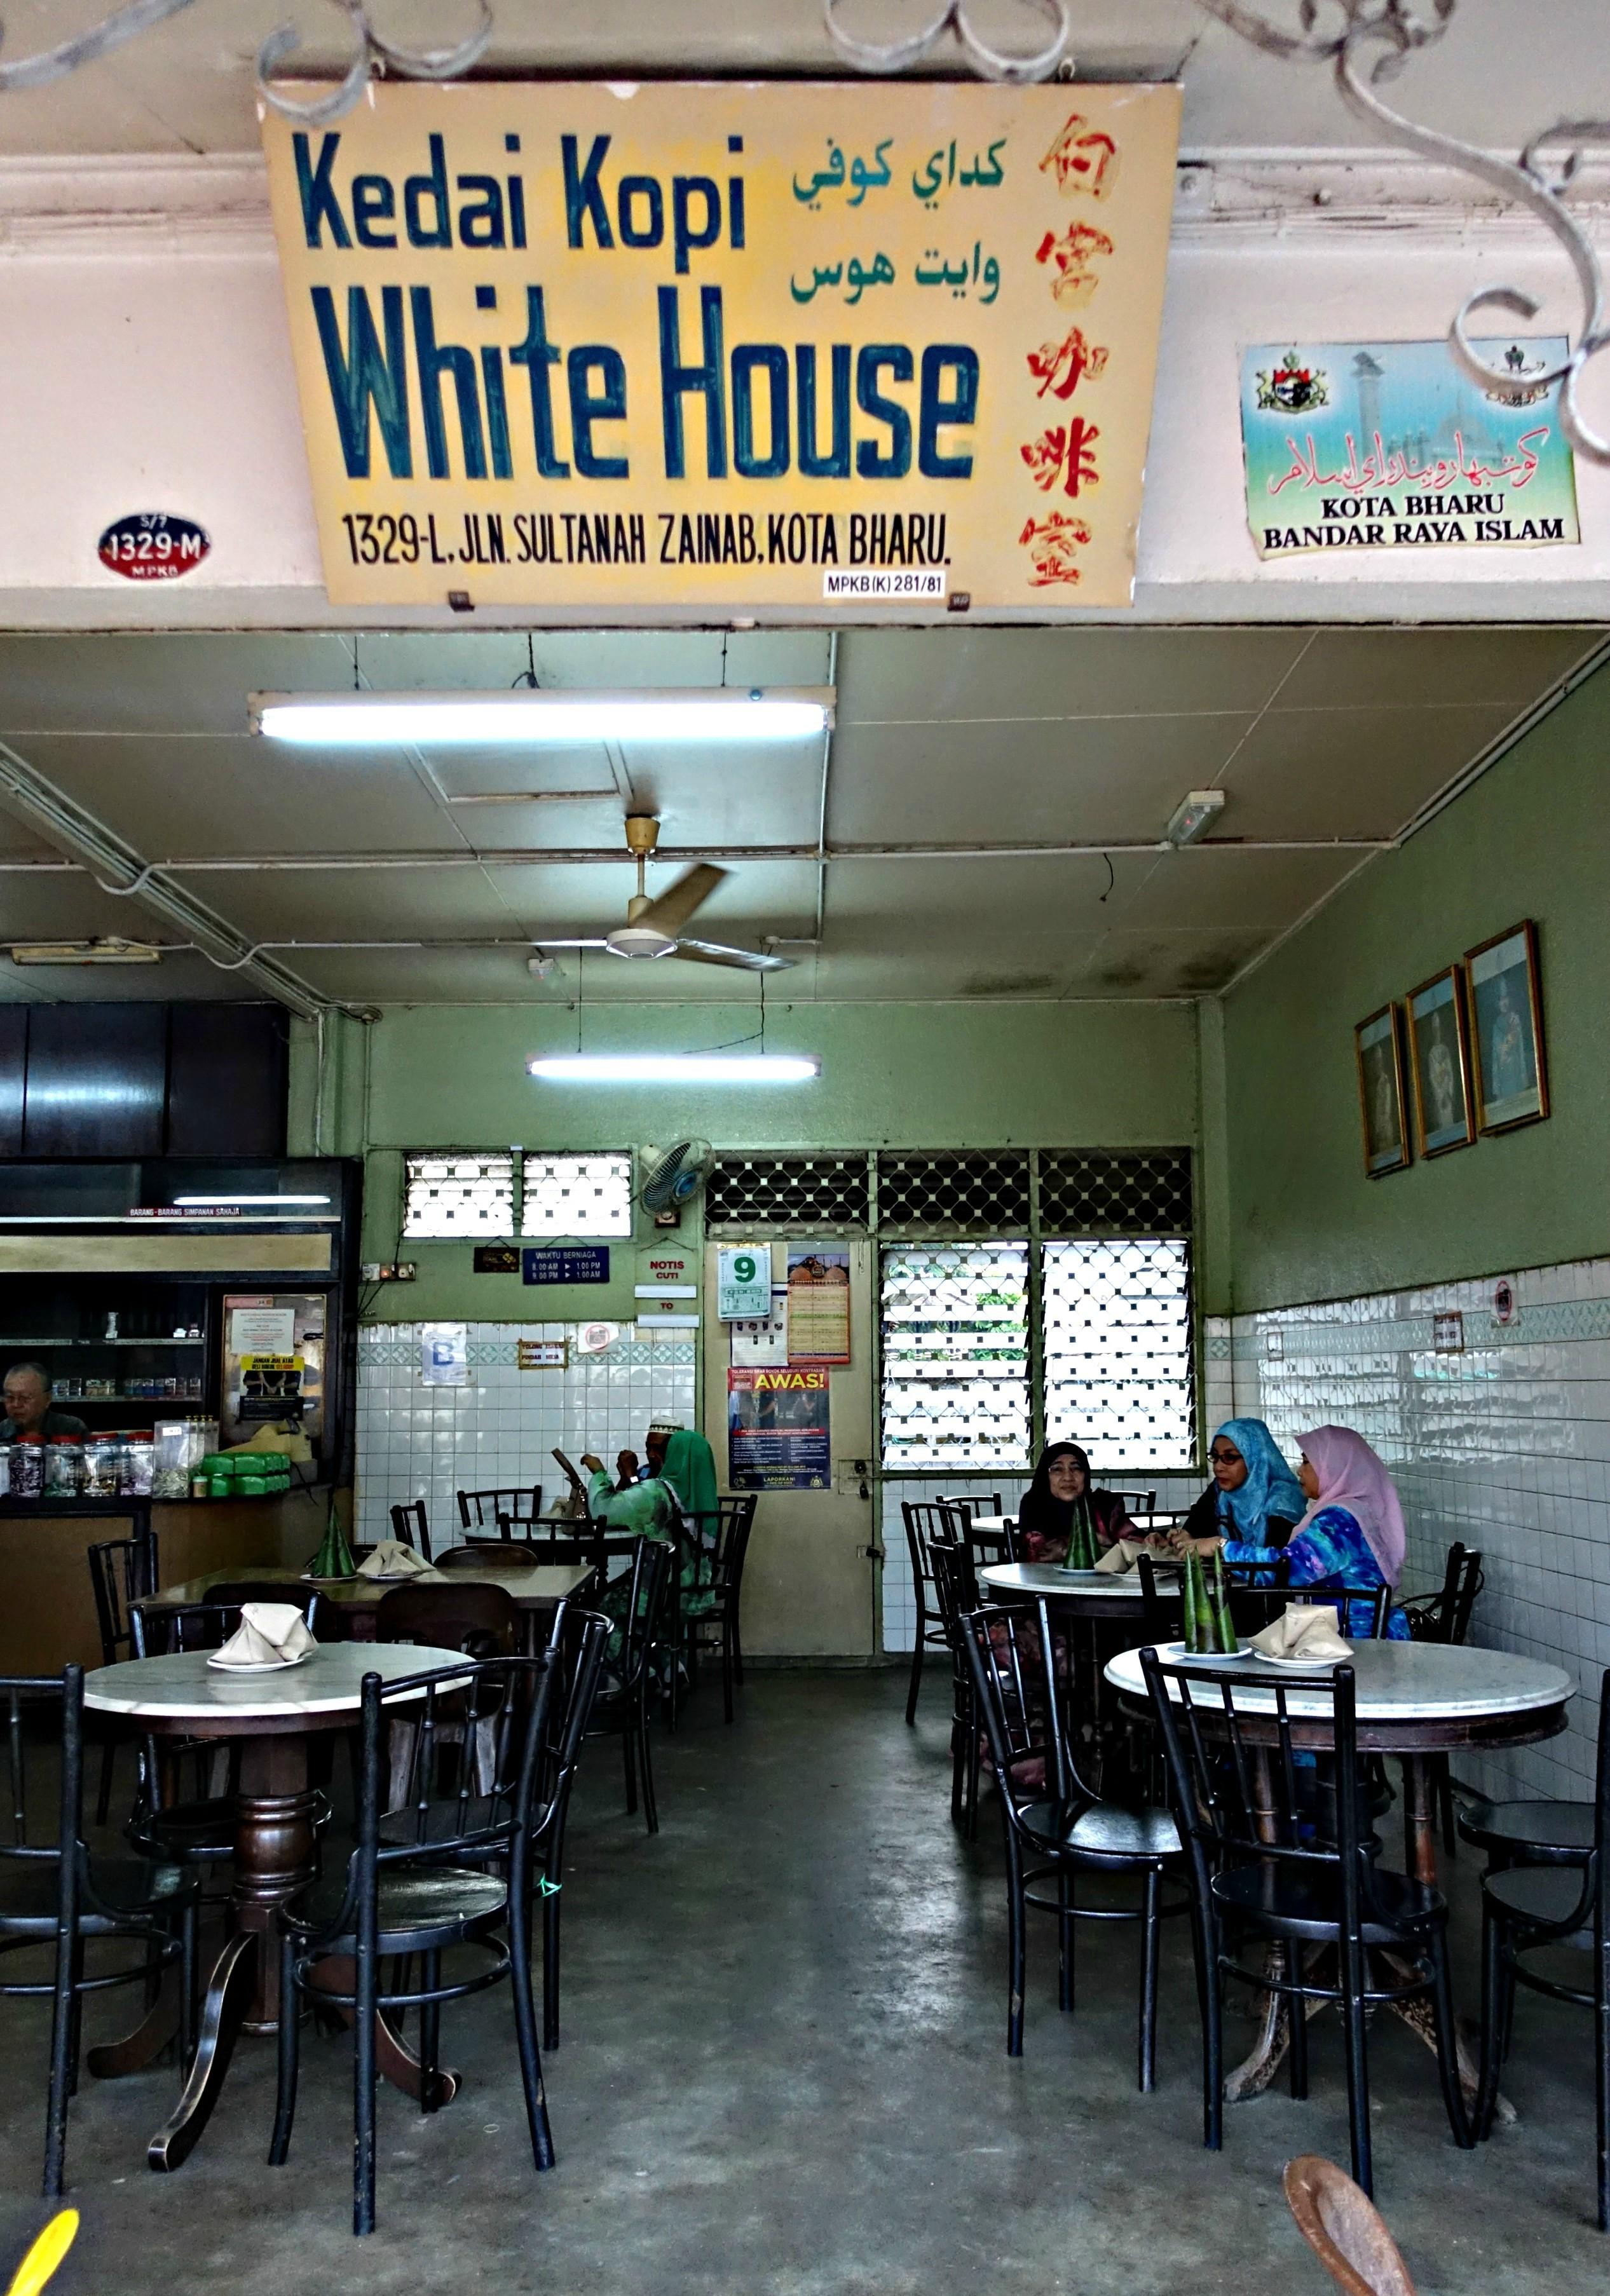 Kota Bharu Malaysia Breakfast At Kedai Kopi White House Asia Wihte 3afef8fb2fa9683b42522583a7f6aa0520780c912533x3613 165 Mb